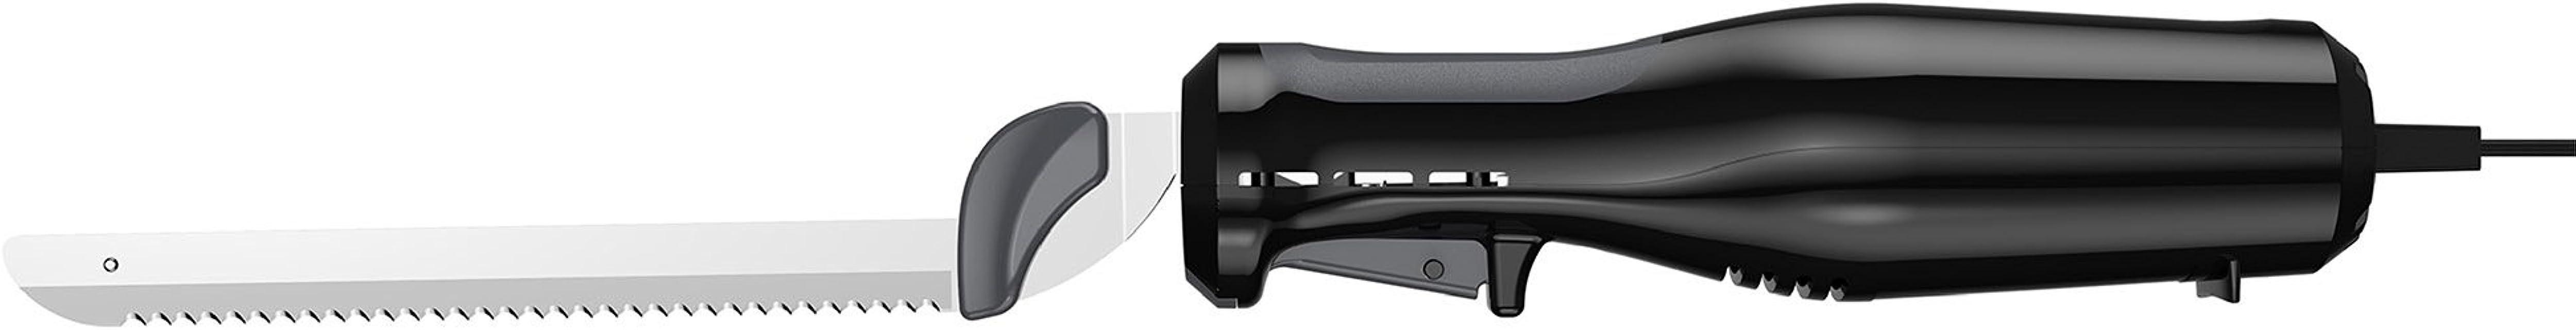 BLACK DECKER 9 Inch Electric Carving Knife Black EK500B